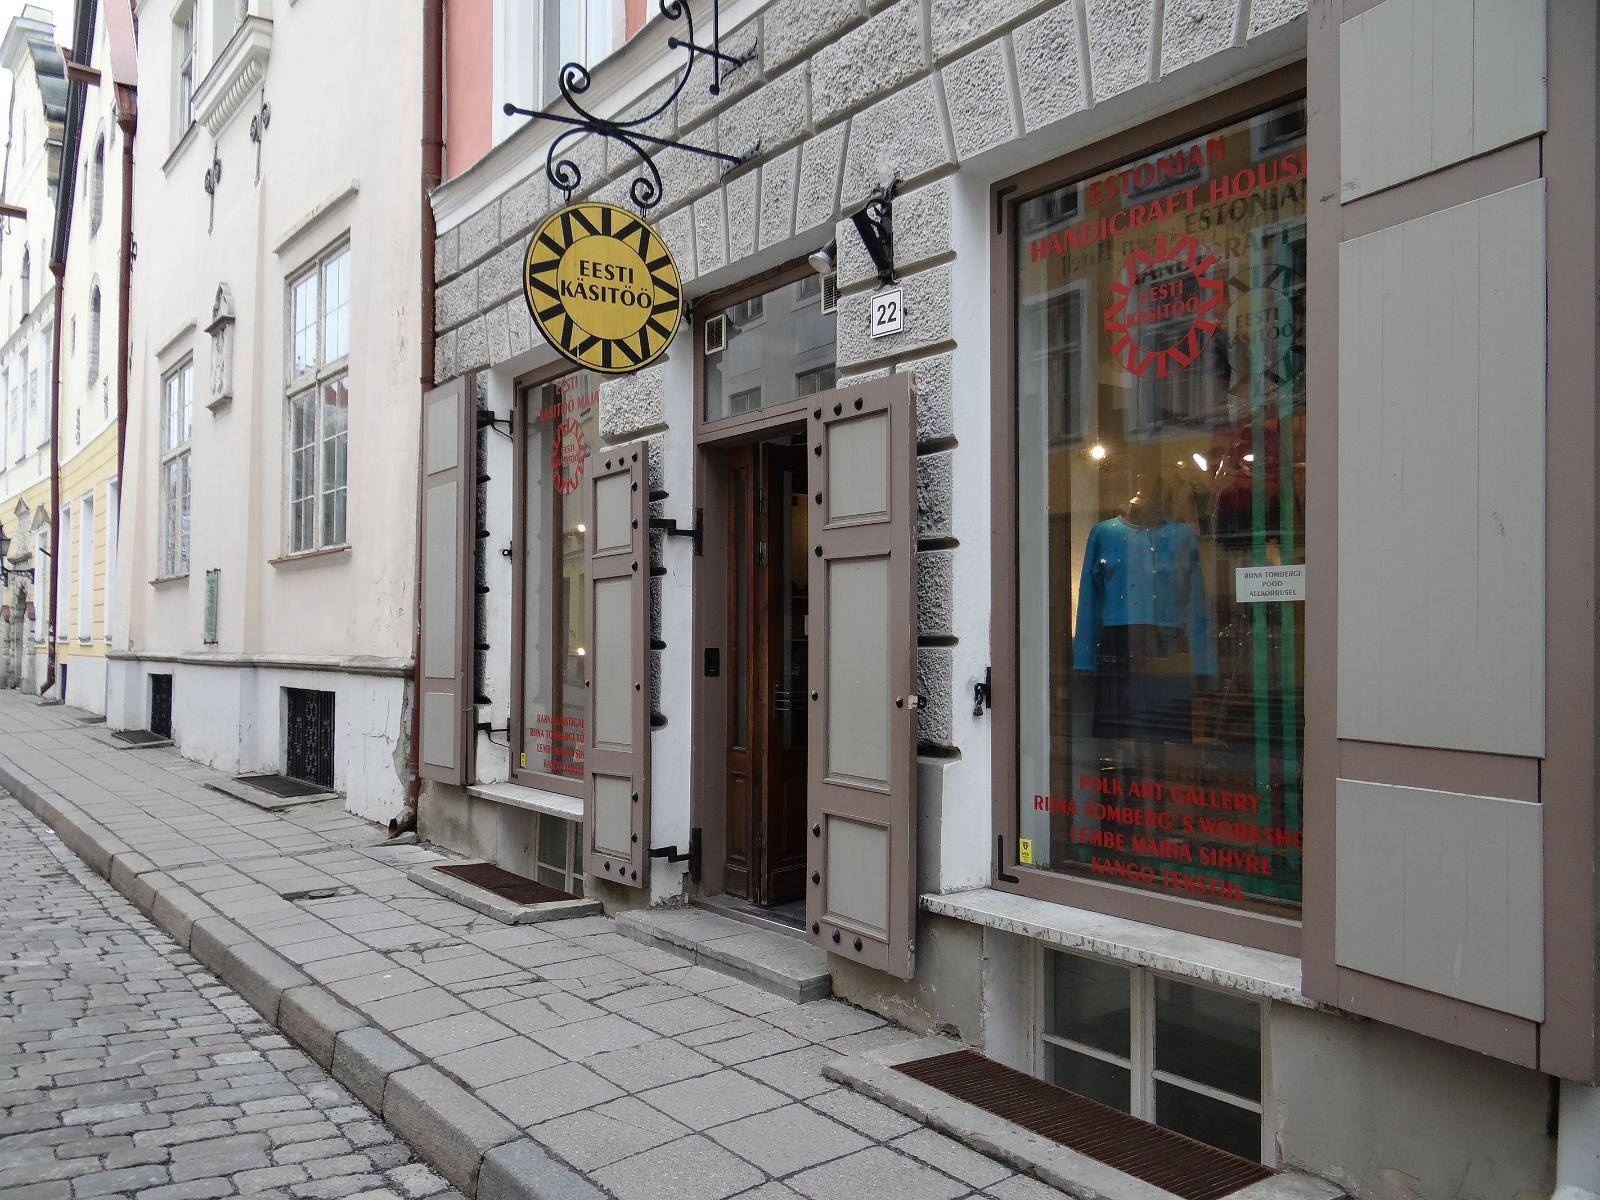 Estonian Handicraft House in Tallinn,Estonia